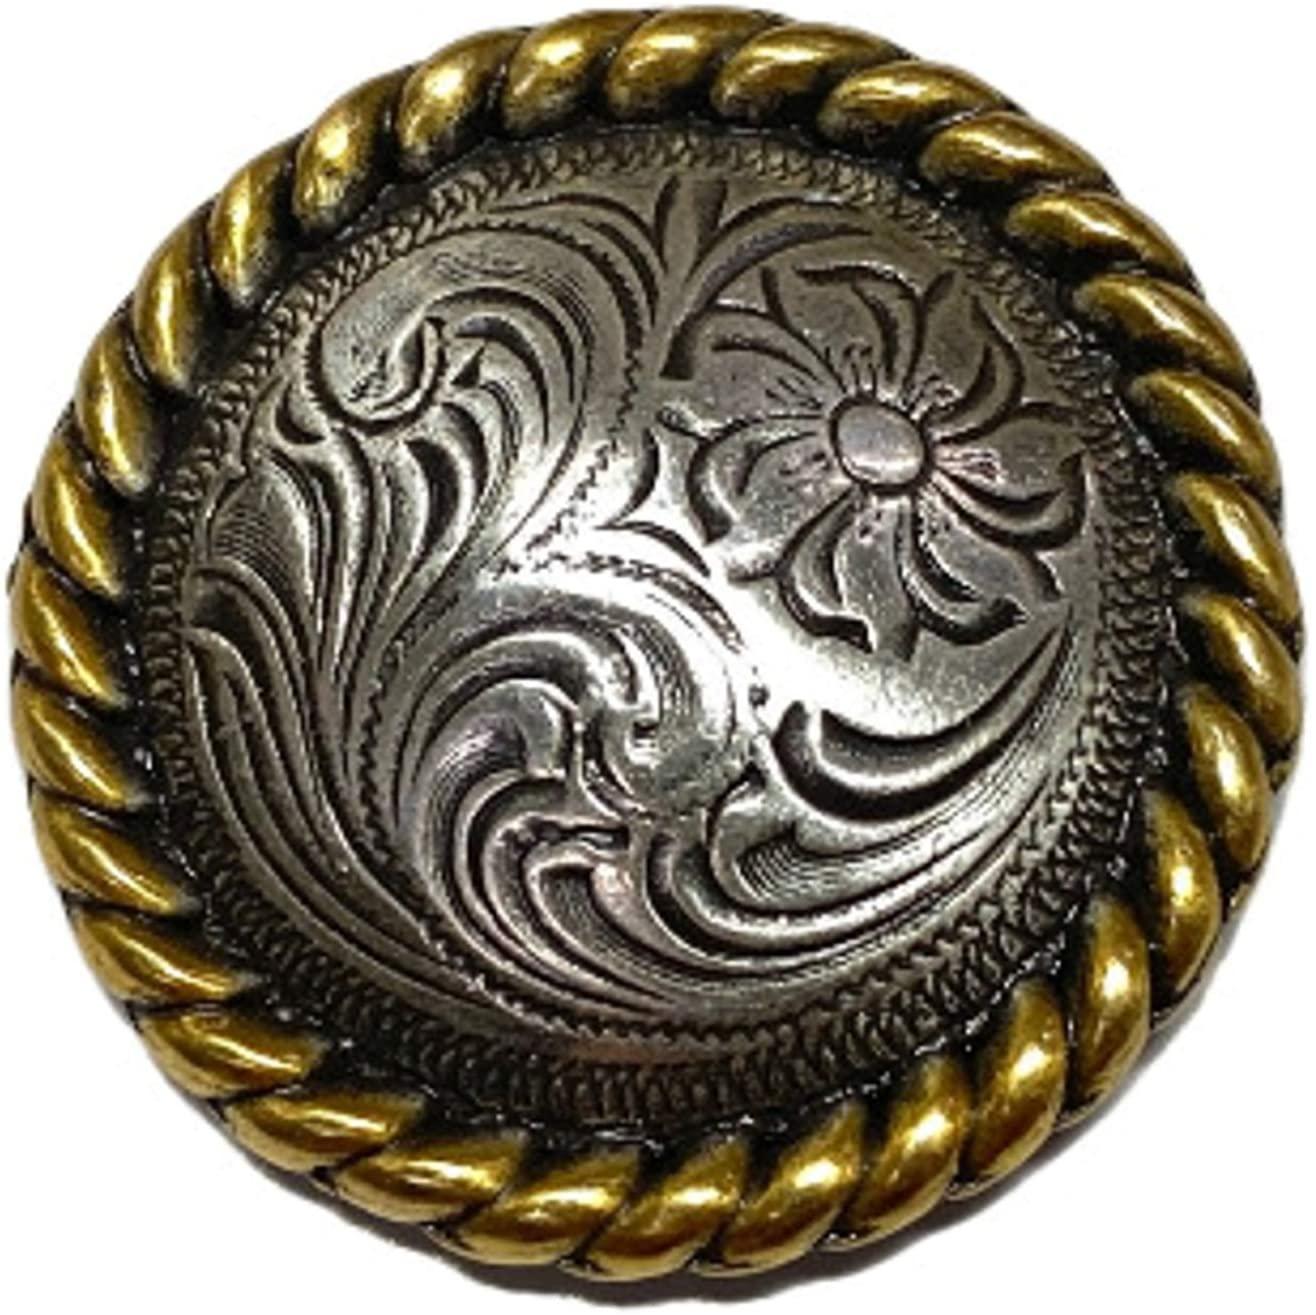 TJ Brotherhood Western Engraved Saddle Gold Concho